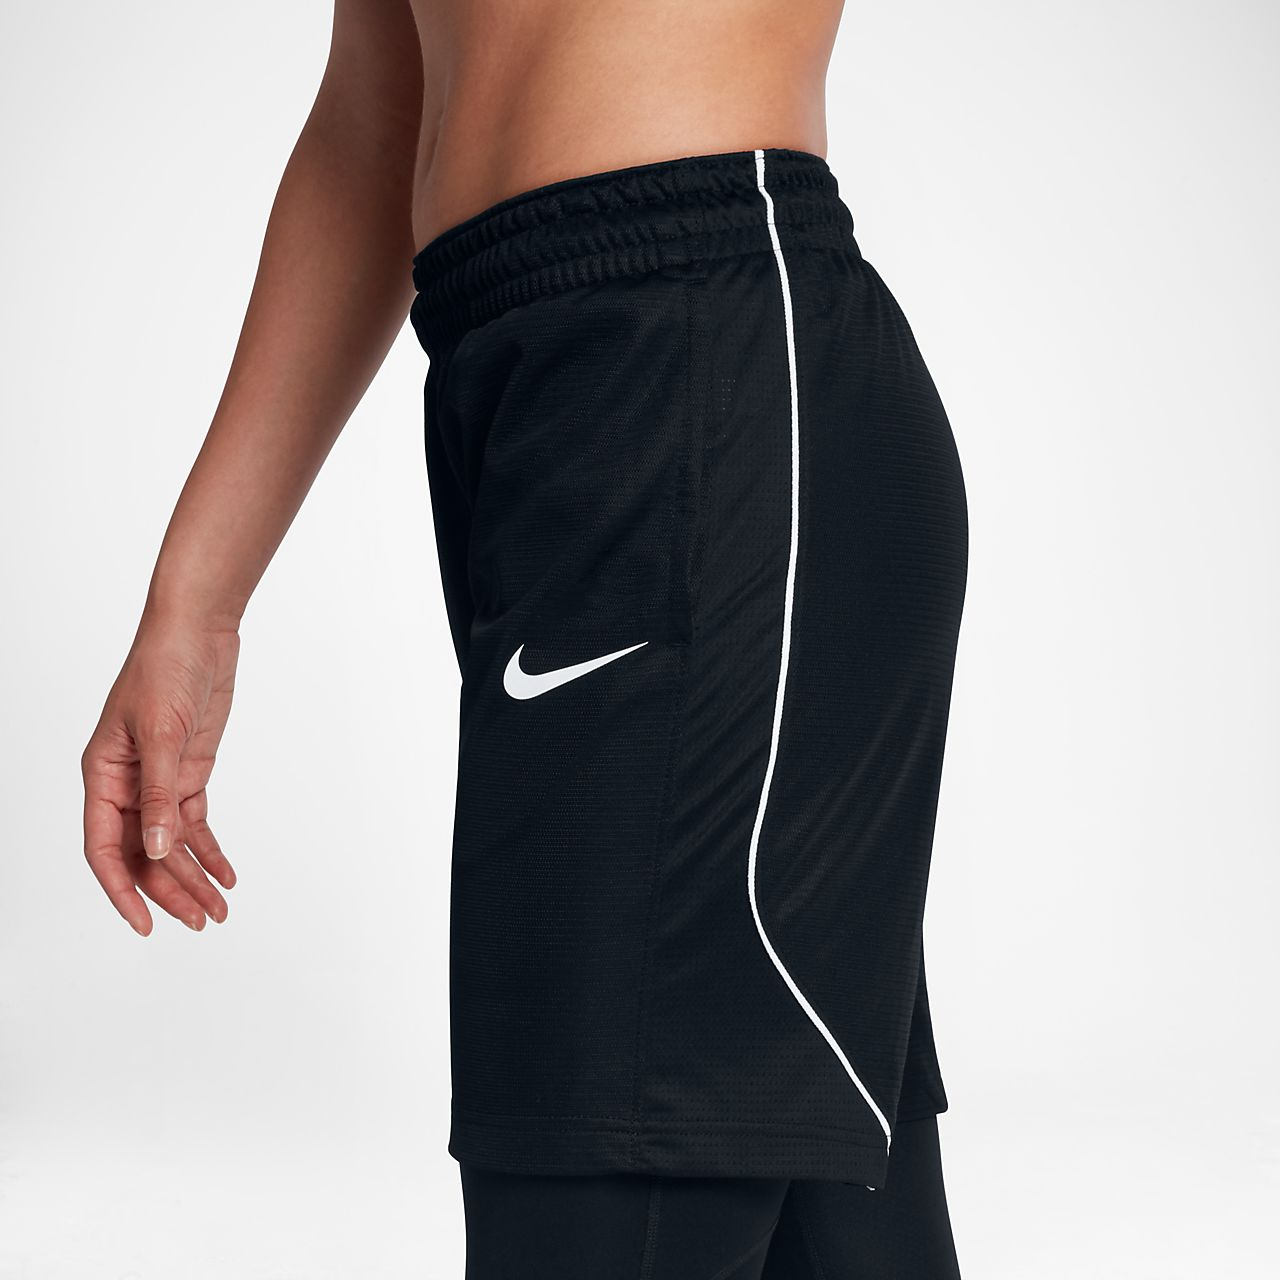 8227be64d3 ... Nike Dry Essential Pantalón corto de baloncesto de 25